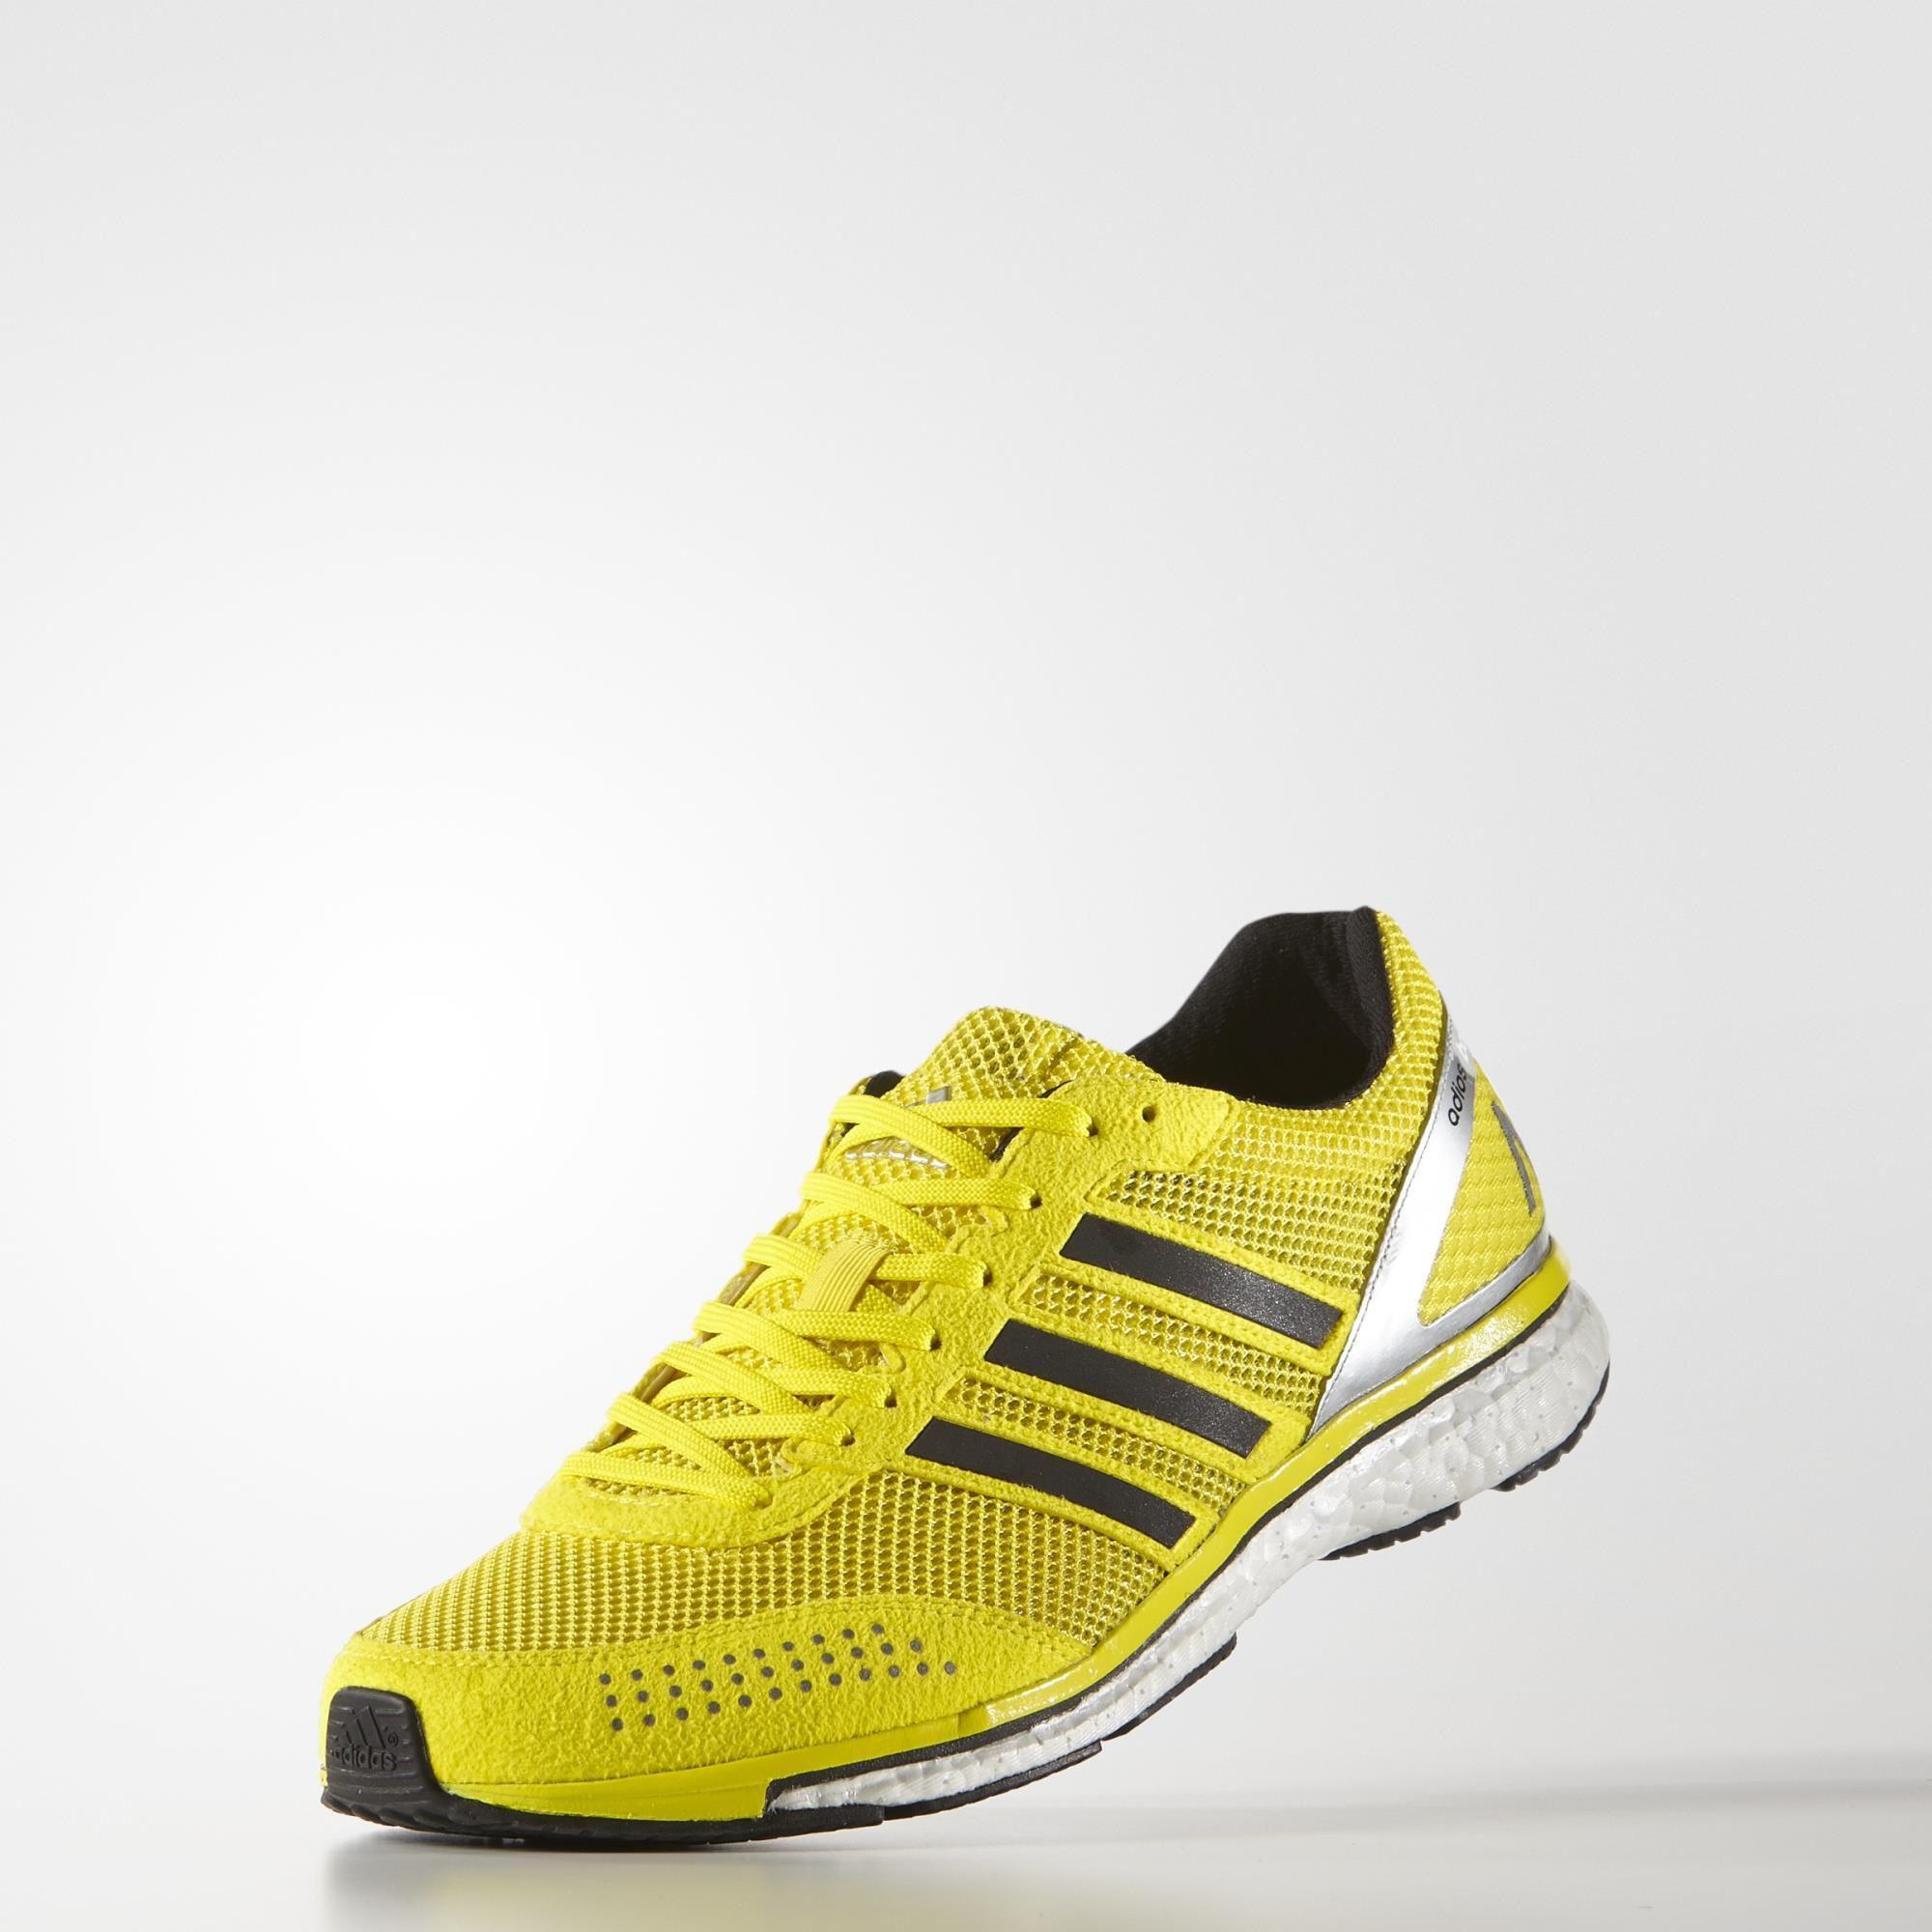 Adidas Adizero Adiós Boost 2.0 Haile Hombre Zapatillas De Deporte - Amarillo dF6oB